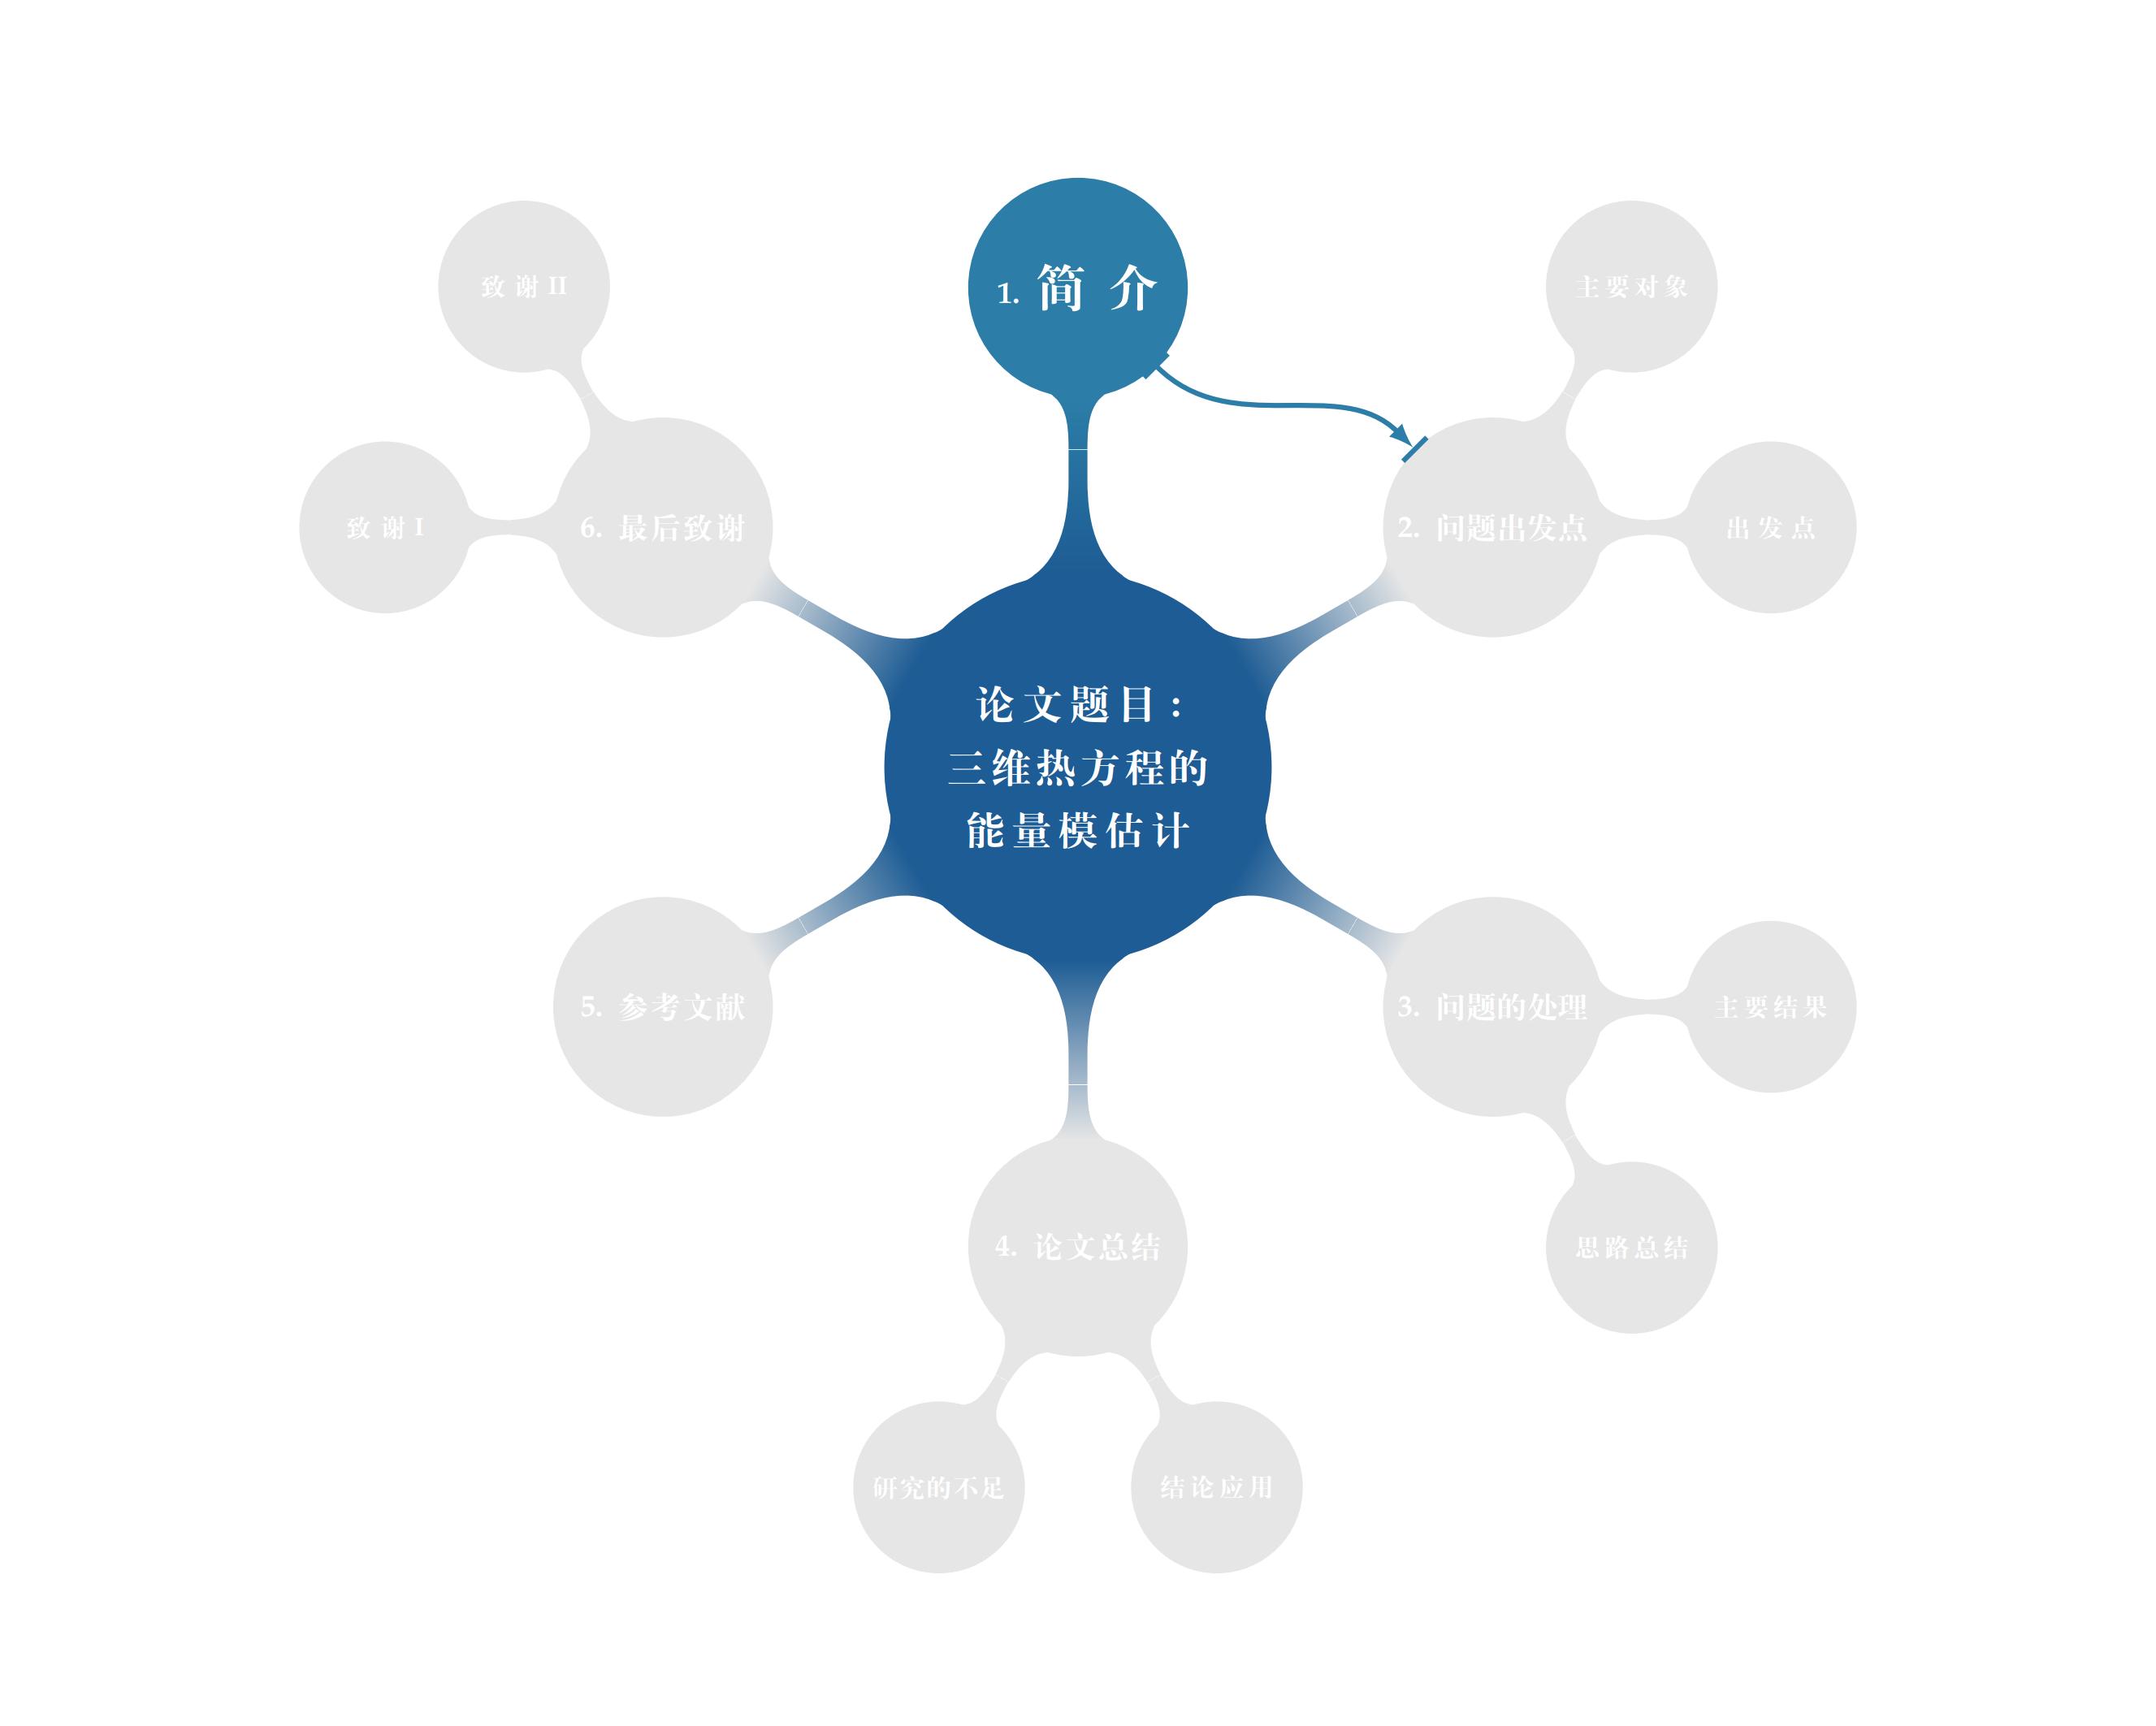 Beamer里的mindmap